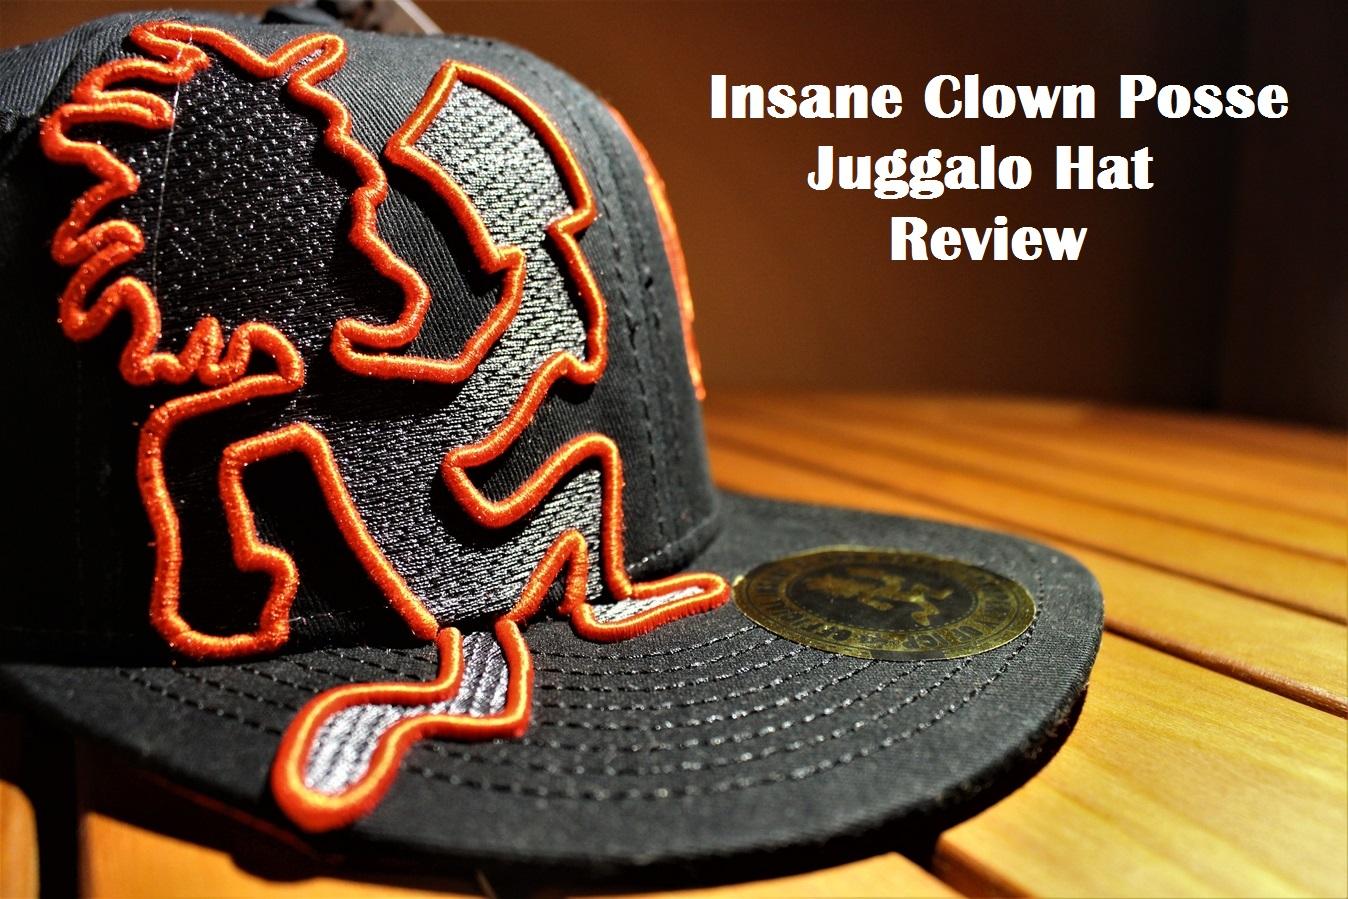 ICP Cap Review – Juggalo Hatchet man hat